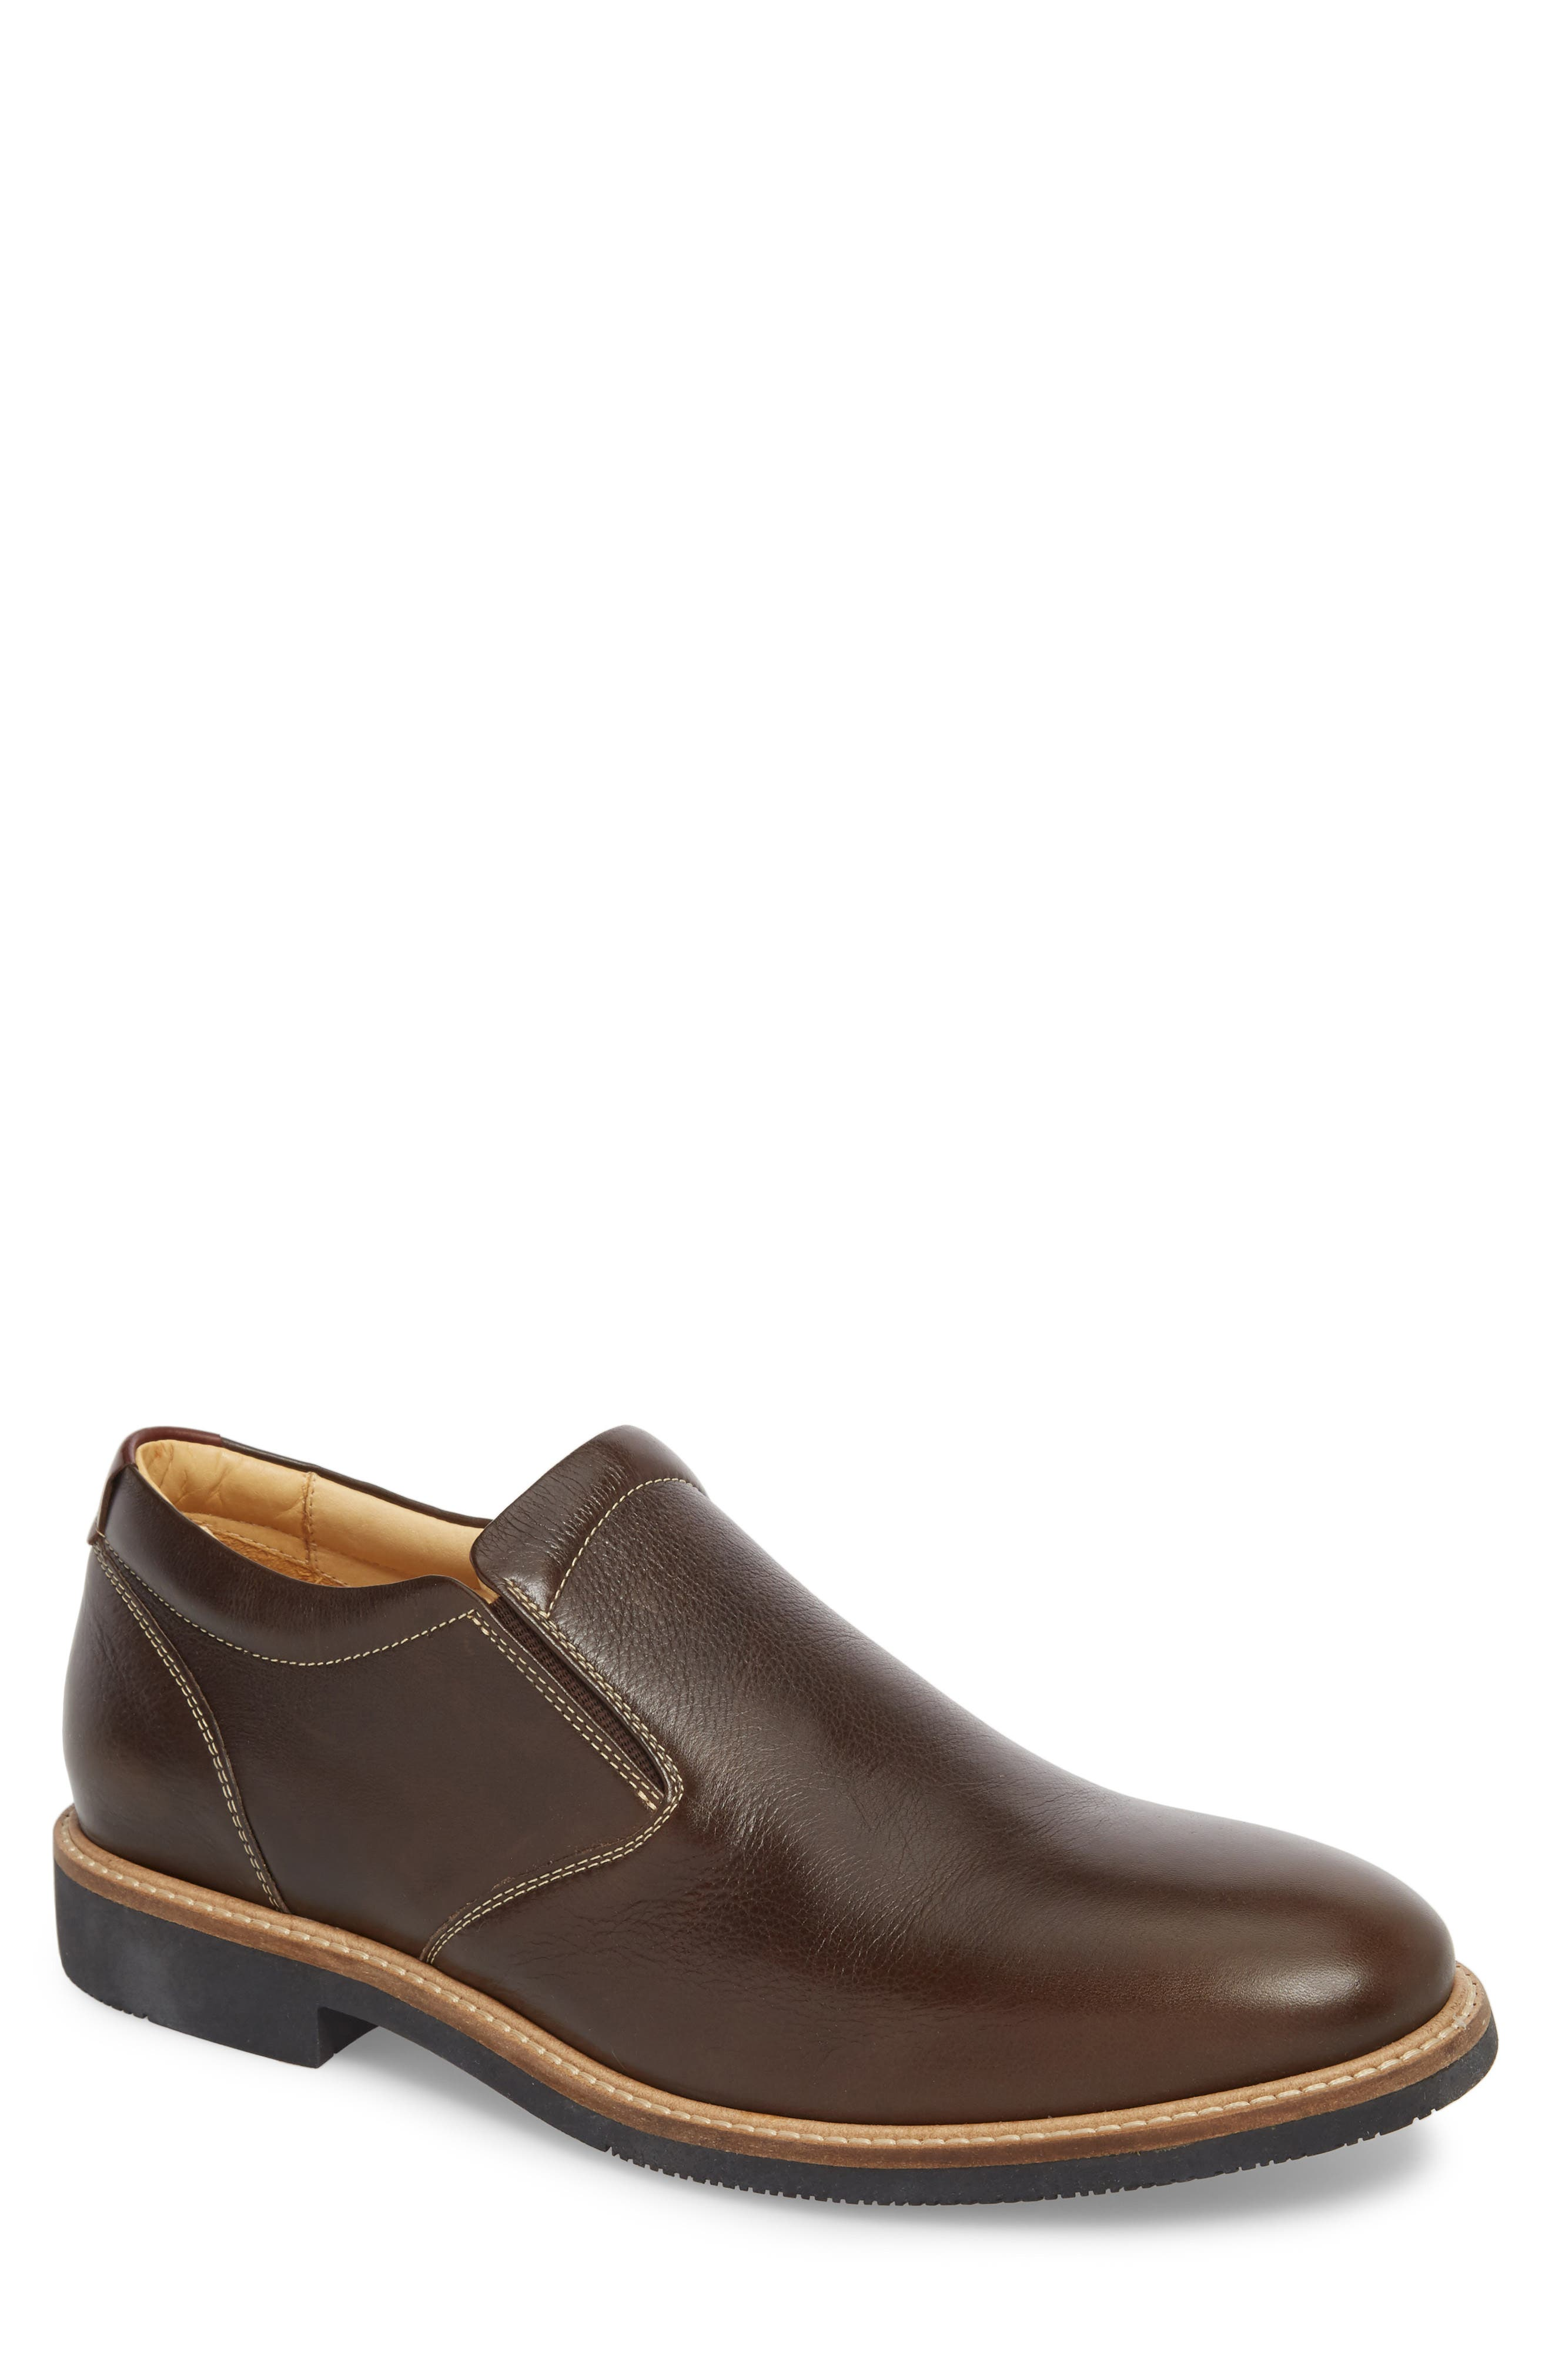 Barlow Plain Toe Slip-On,                             Main thumbnail 1, color,                             Dark Brown Leather